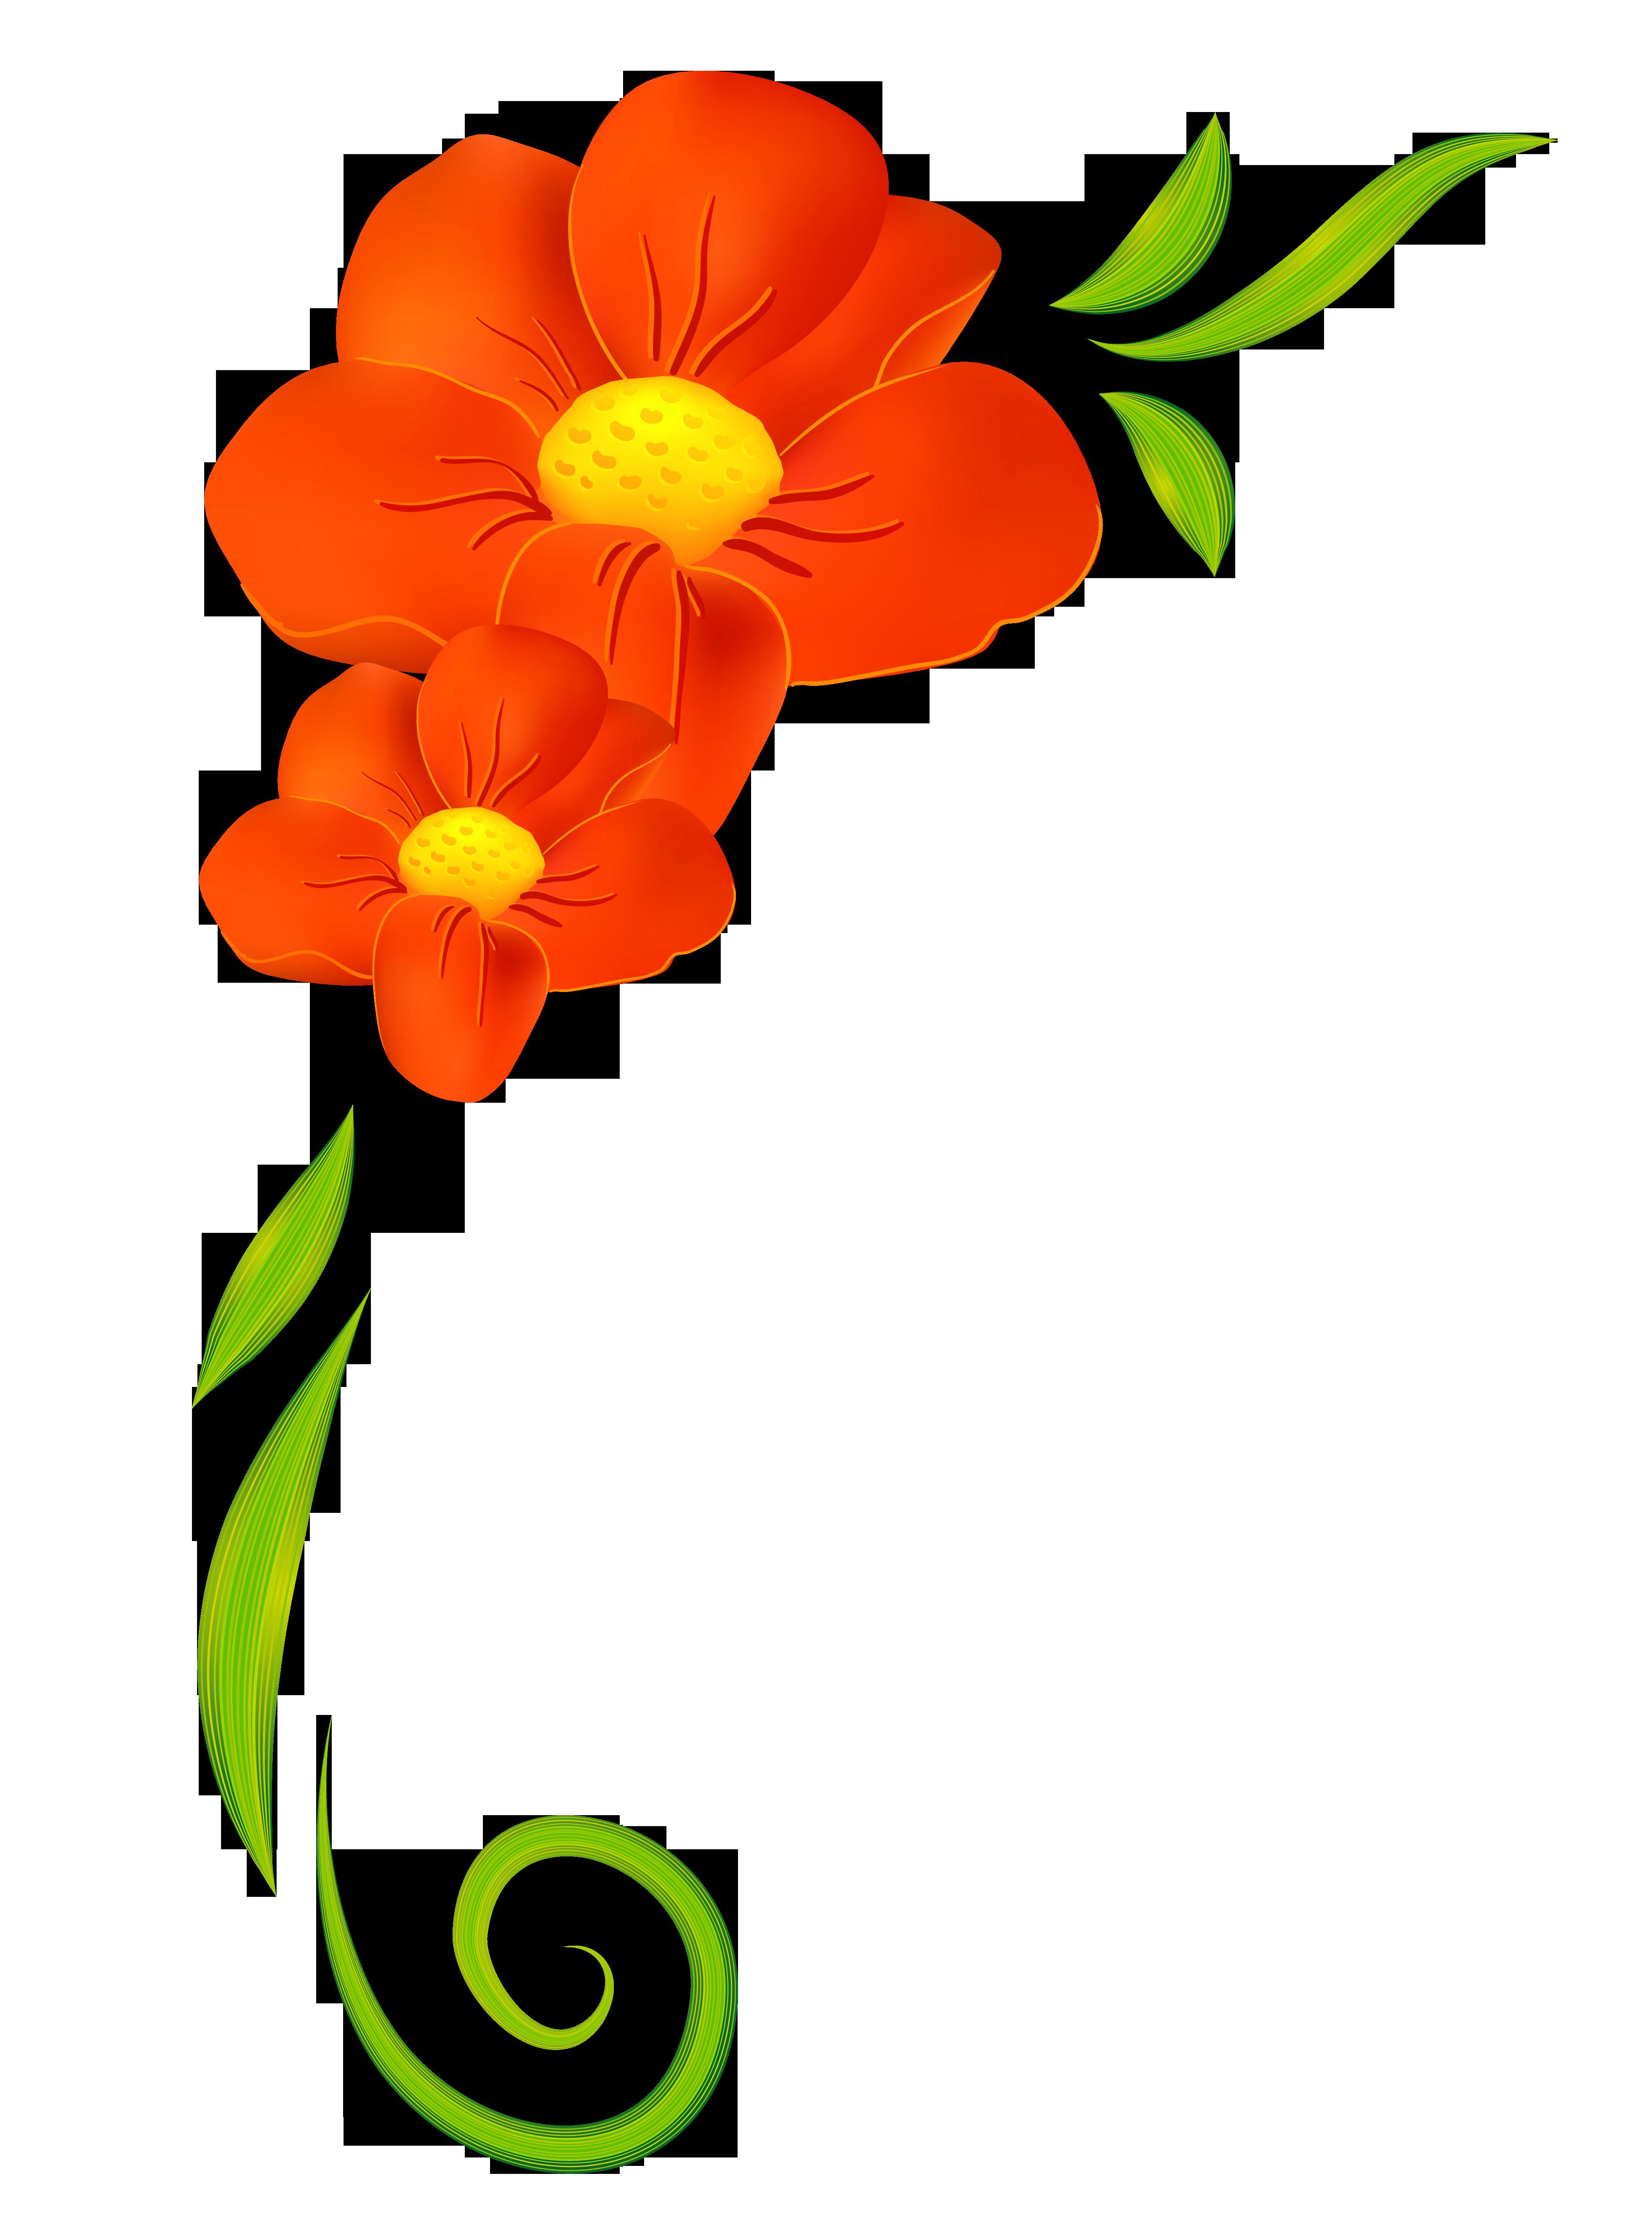 Flower Clipart Hd   Free download best Flower Clipart Hd on ...